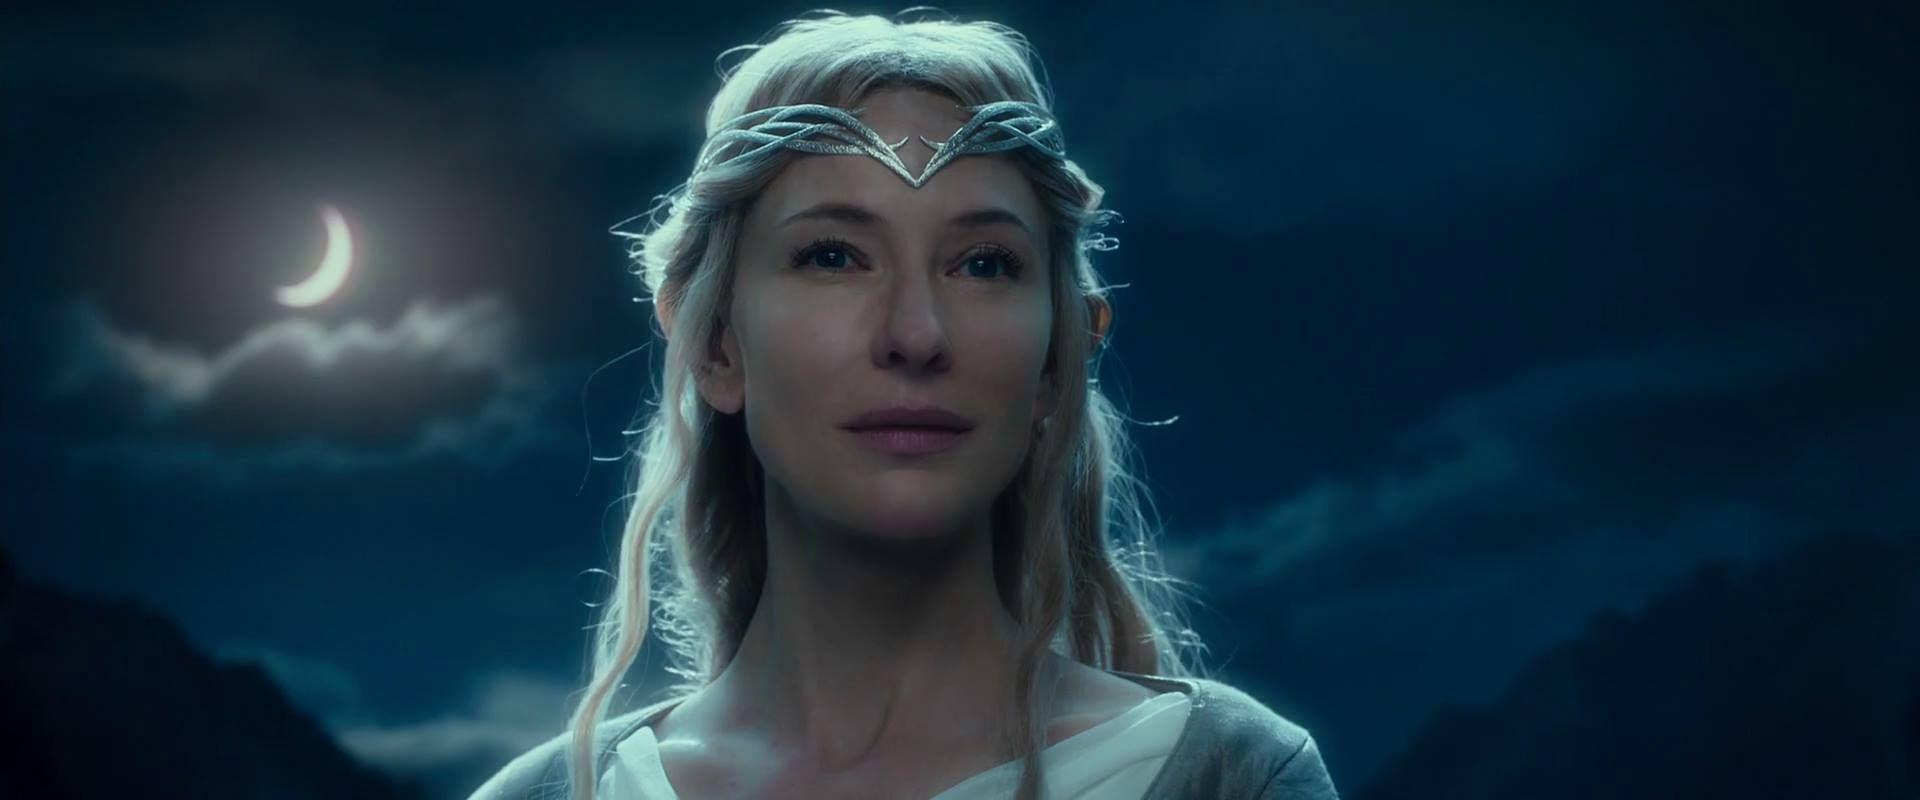 Galadriel ( Cate Blanchett), El hobbit: un viaje inesperado, 2012. Peter Jackson.